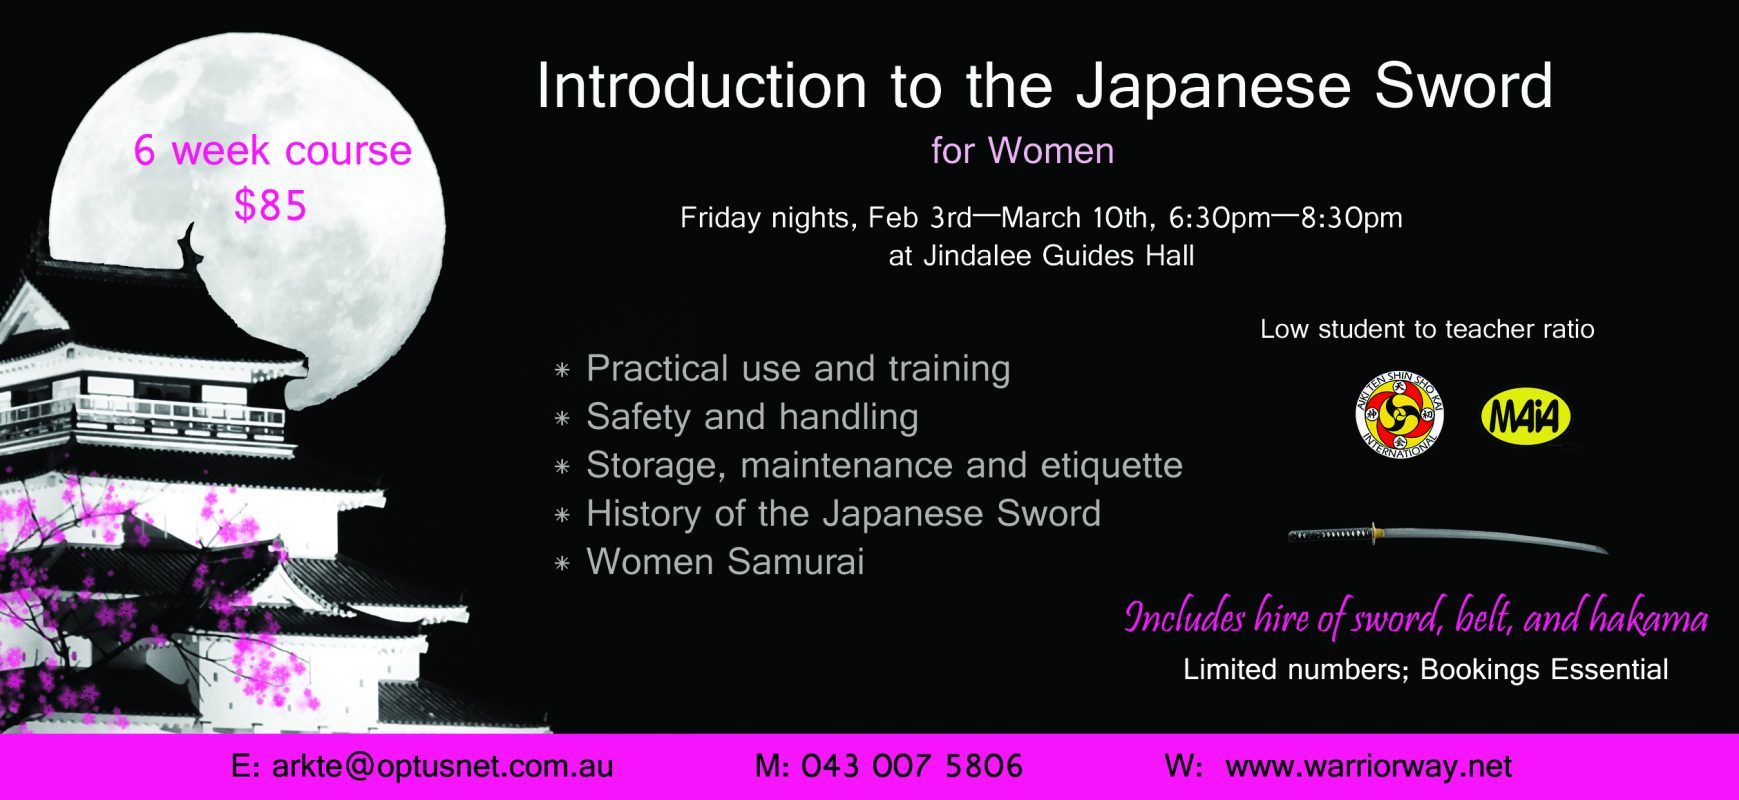 Japanese Sword classes, Aikijutsu Classes, and Childrens' classes